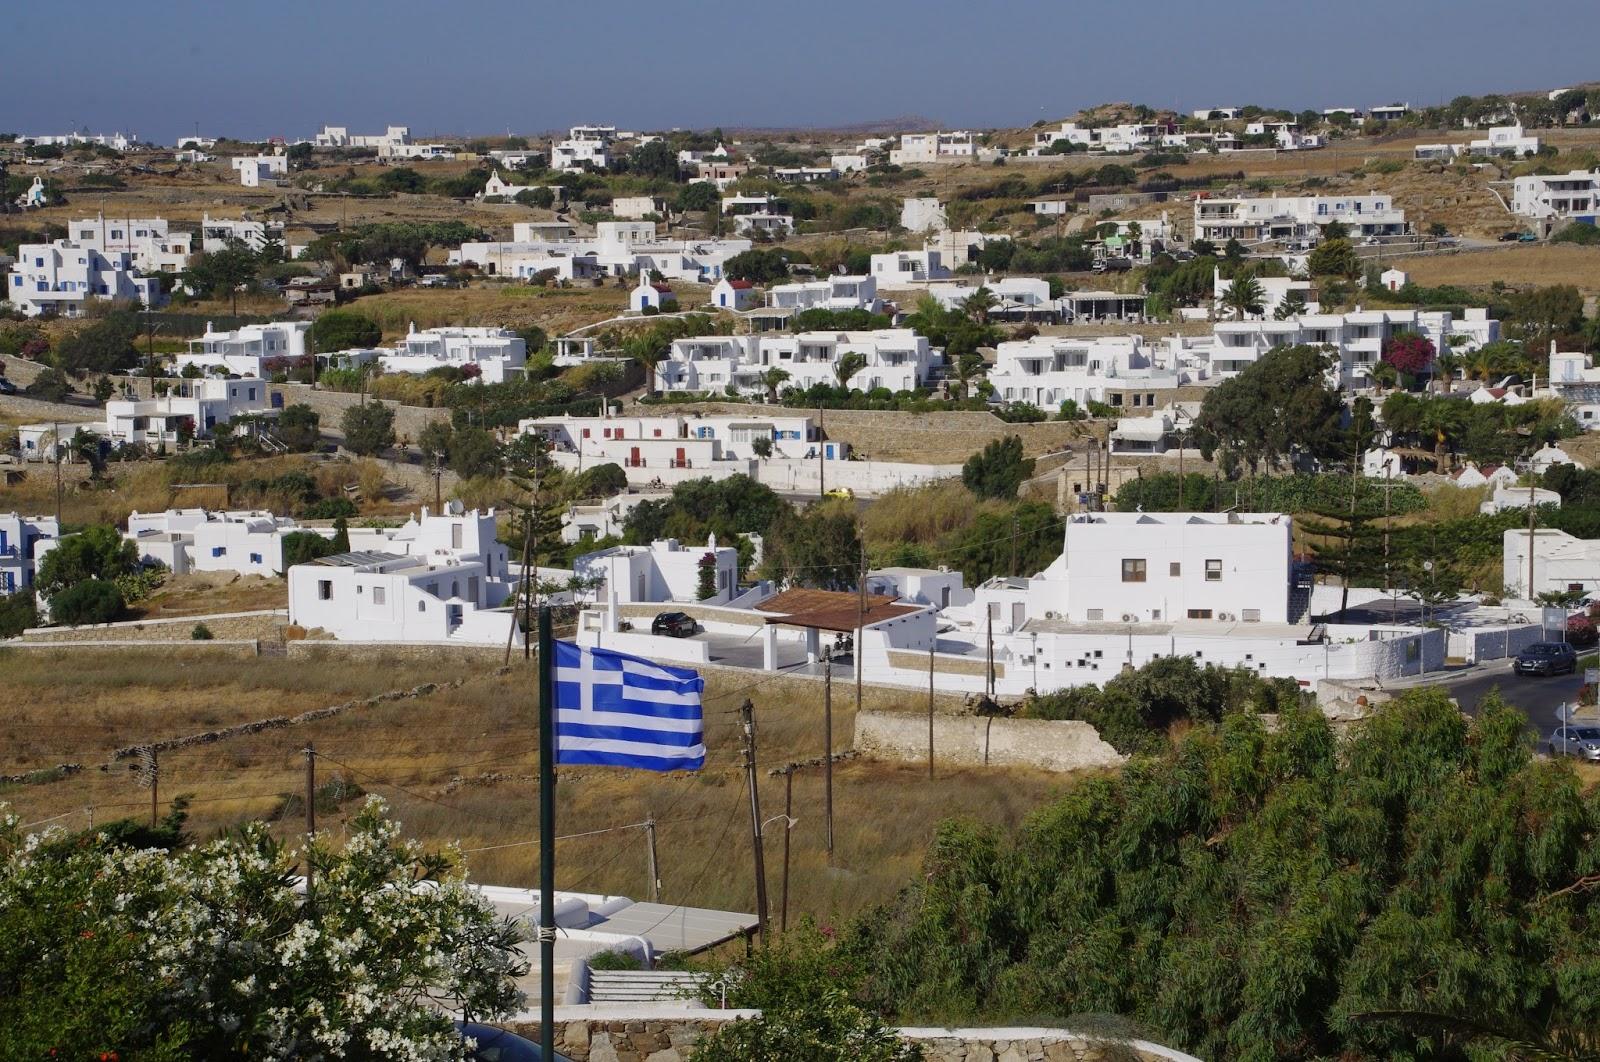 Tharroe of Mykonos Balcony Views Inland